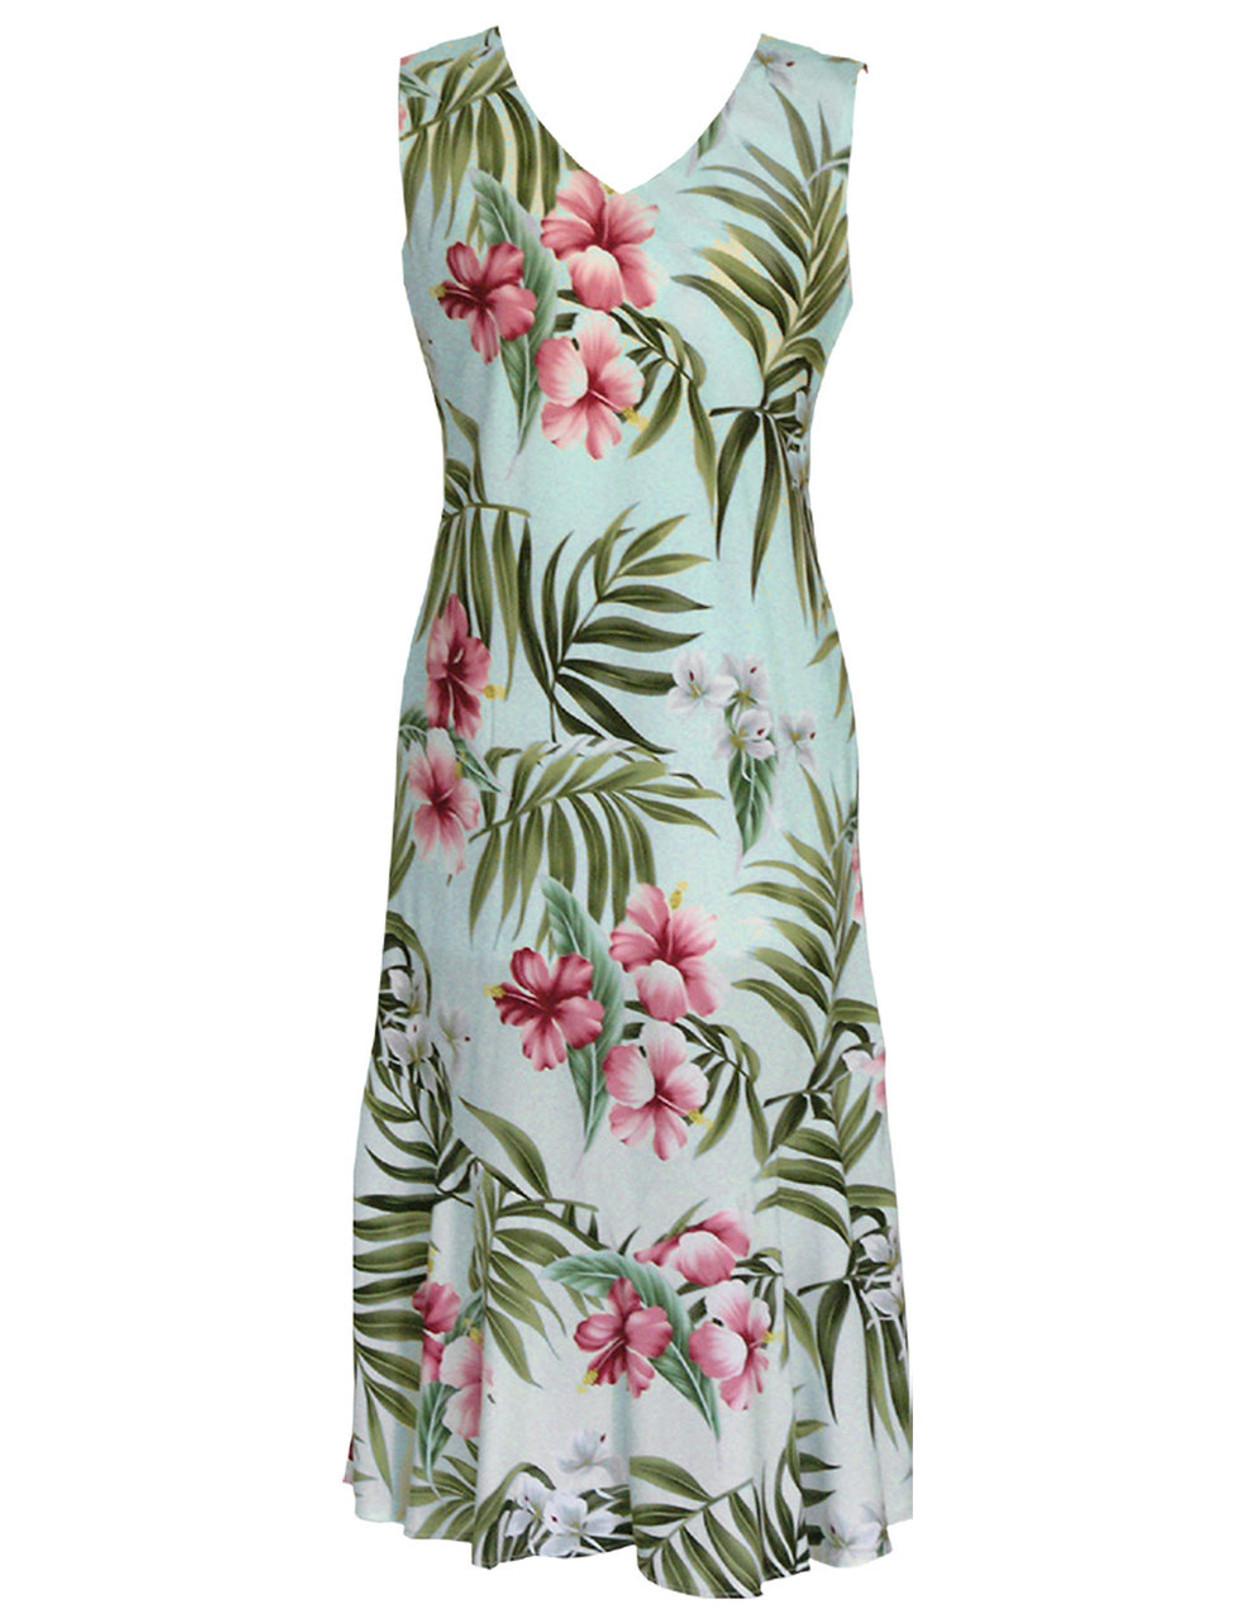 02808f290c8b Nalani Maxi Tea Length Sleeveless Rayon Dresses 100% Rayon Fabric Maxi  Sleeveless Style Bias Cut